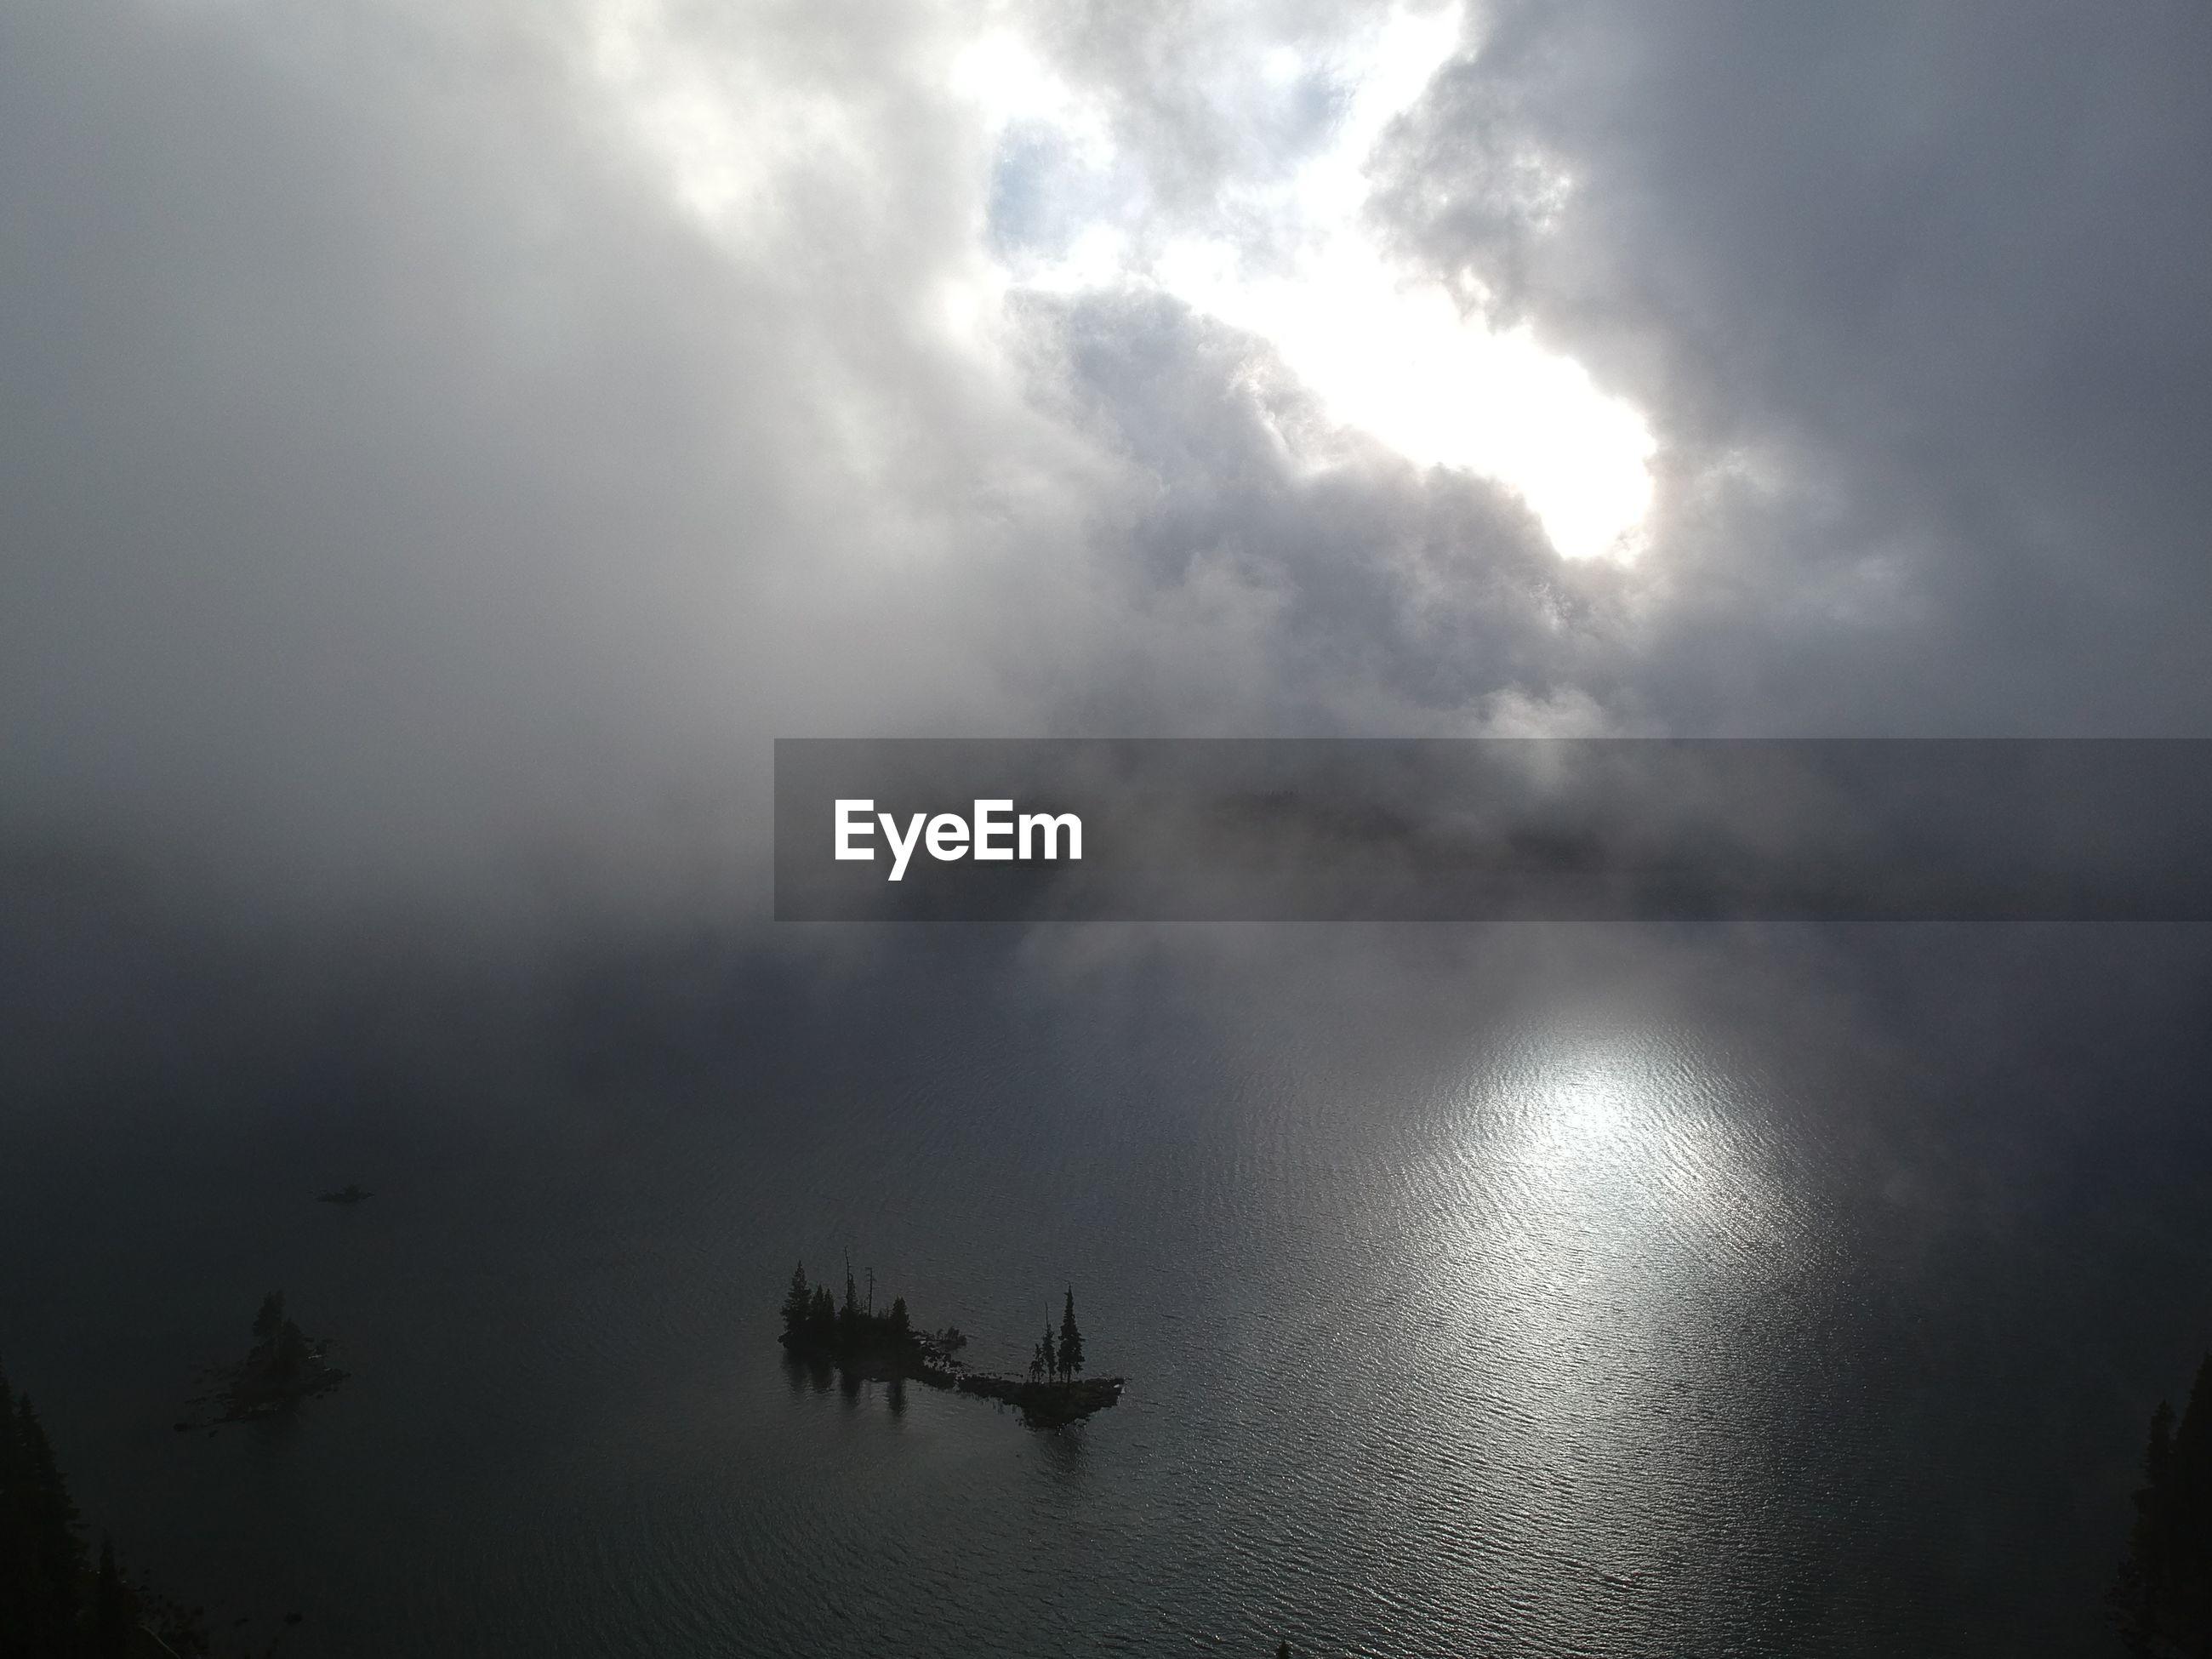 SILHOUETTE PEOPLE IN LAKE AGAINST SKY